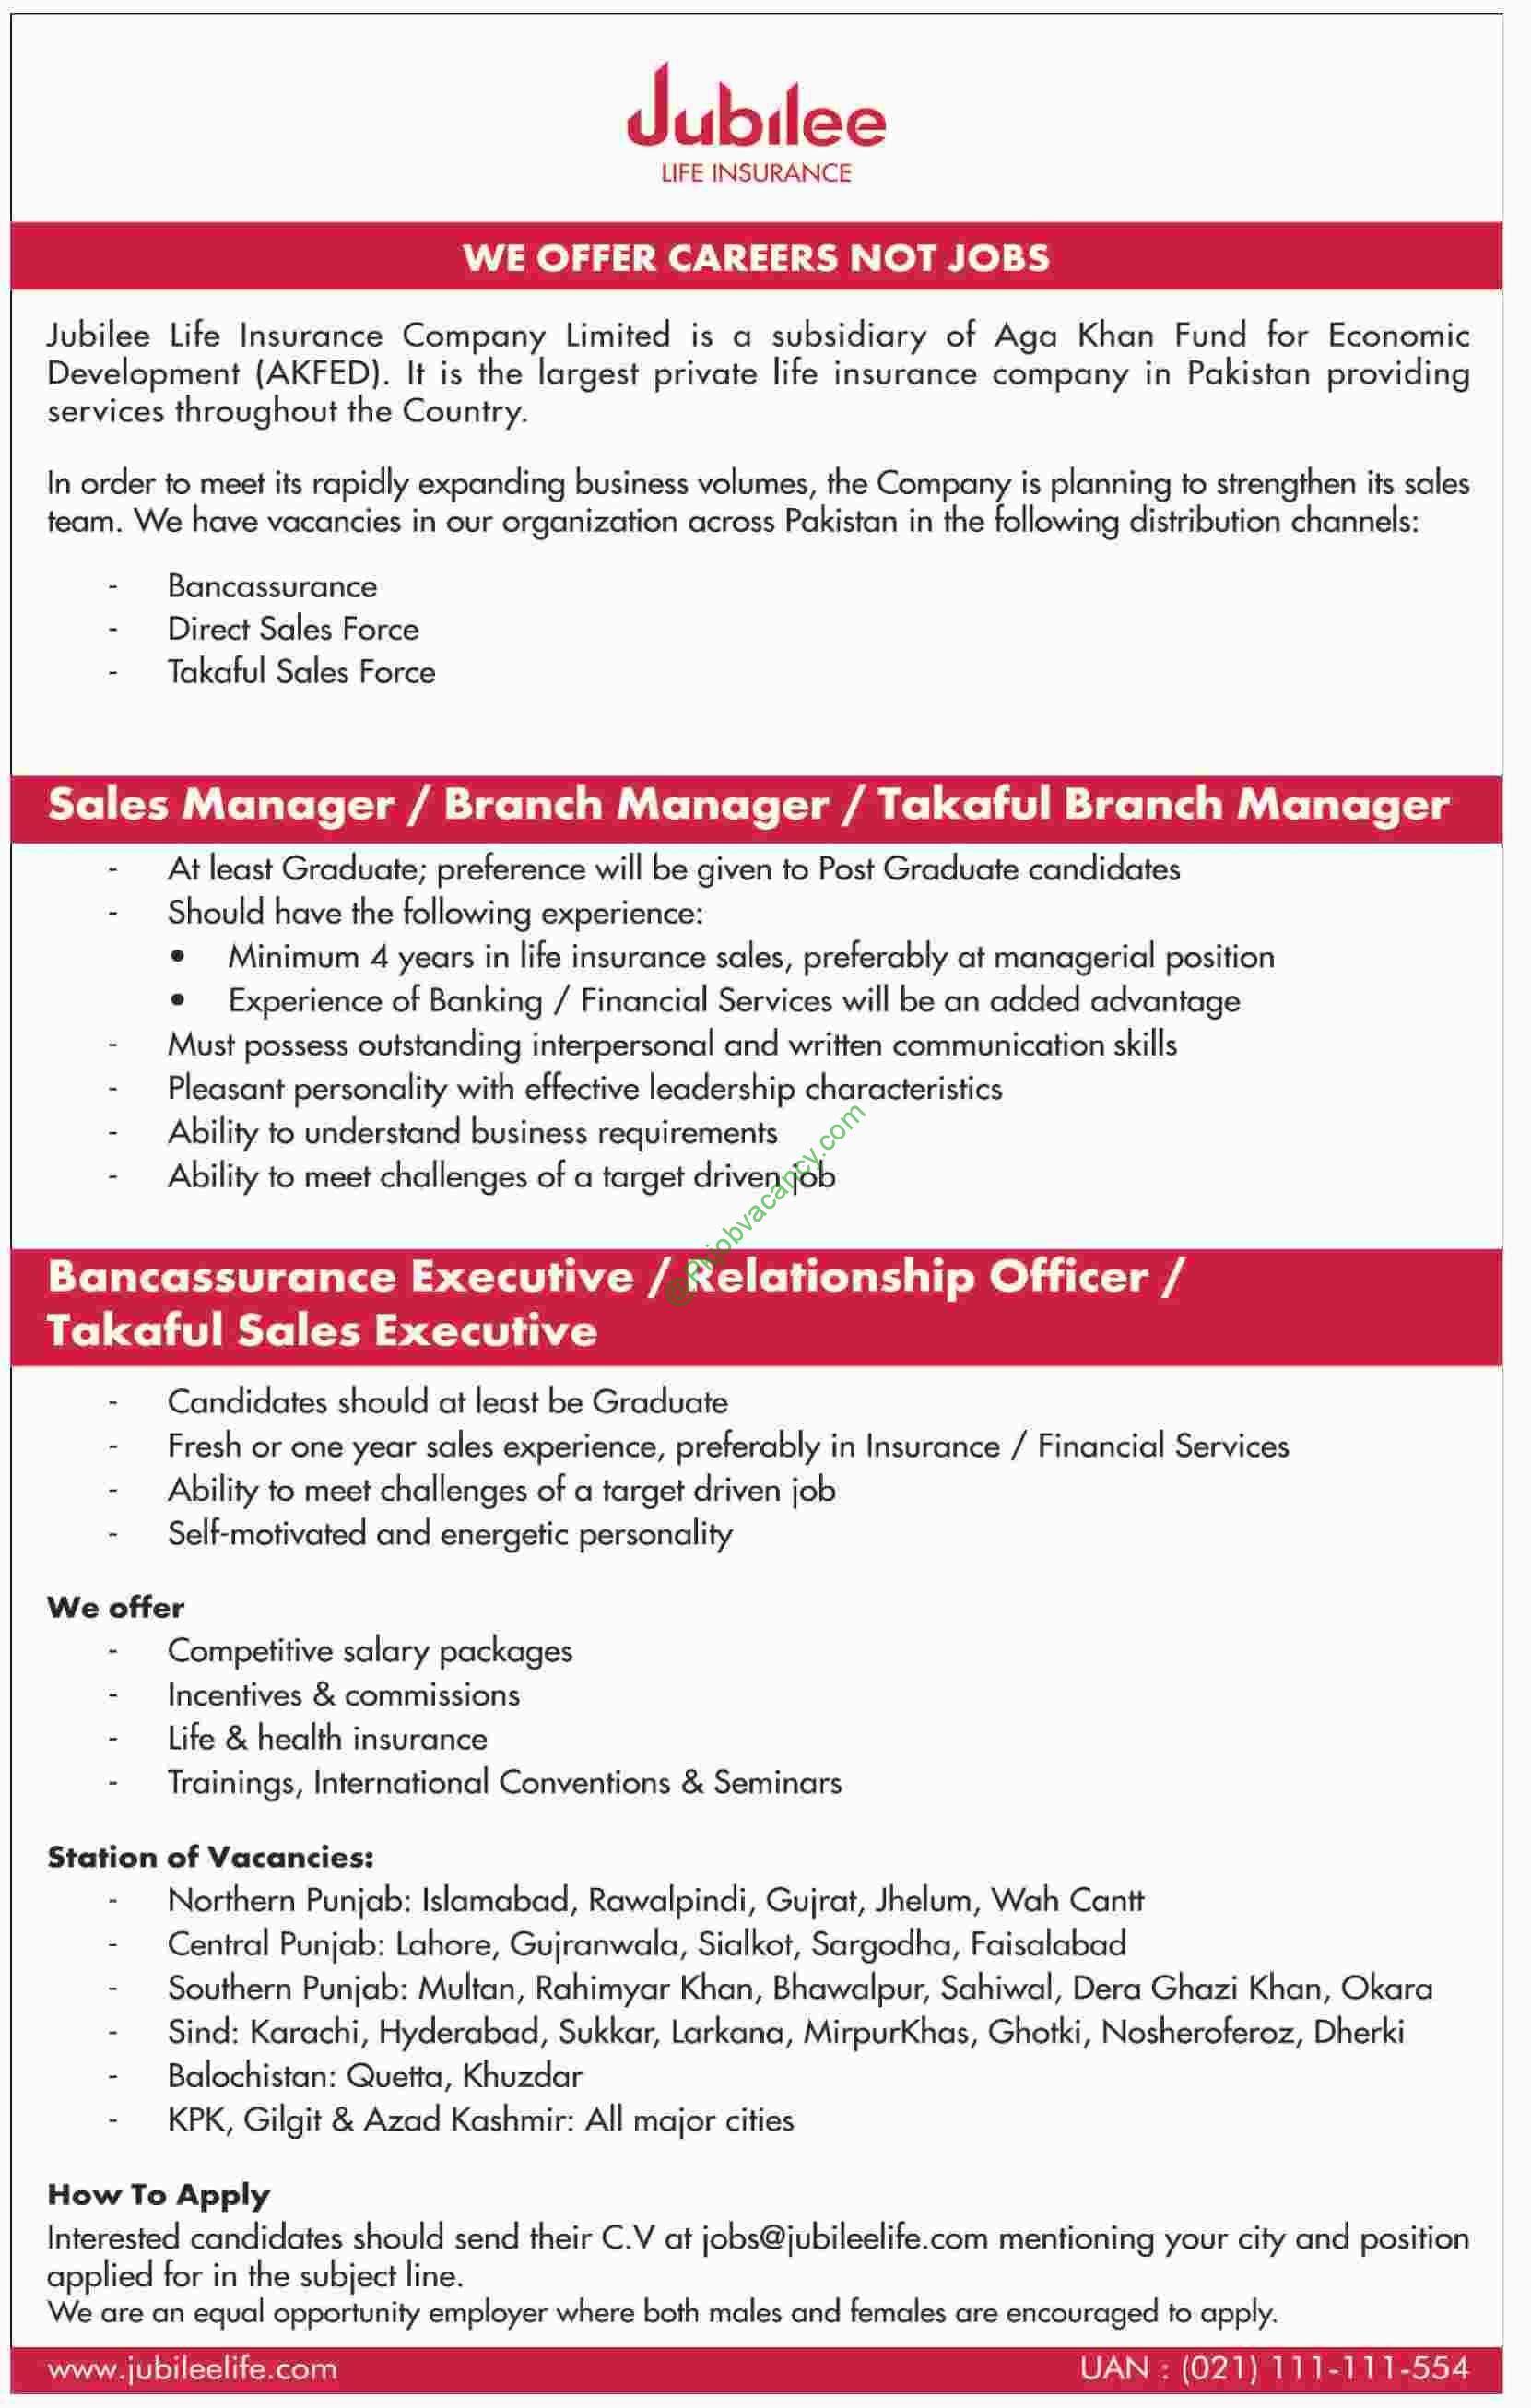 Jubilee Life Insurance Pakistan Latest Jobs January 2017 Apply